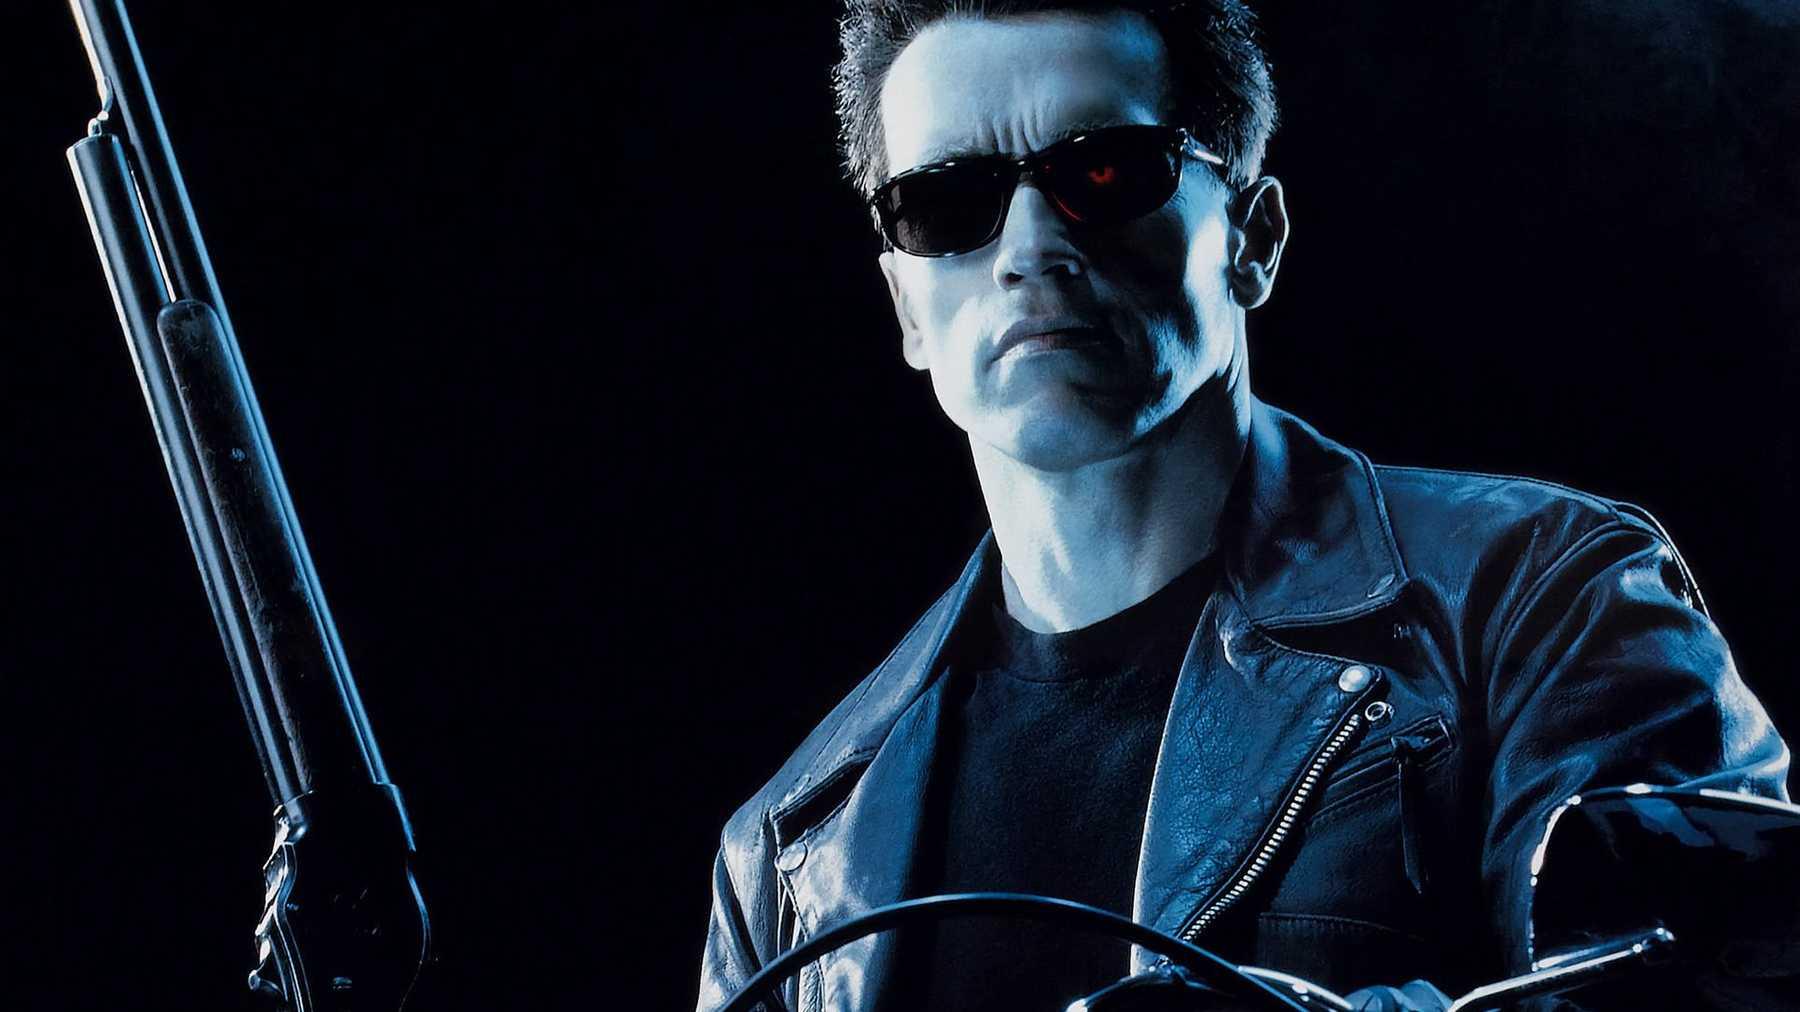 Movie Review – Terminator 2: Judgement Day